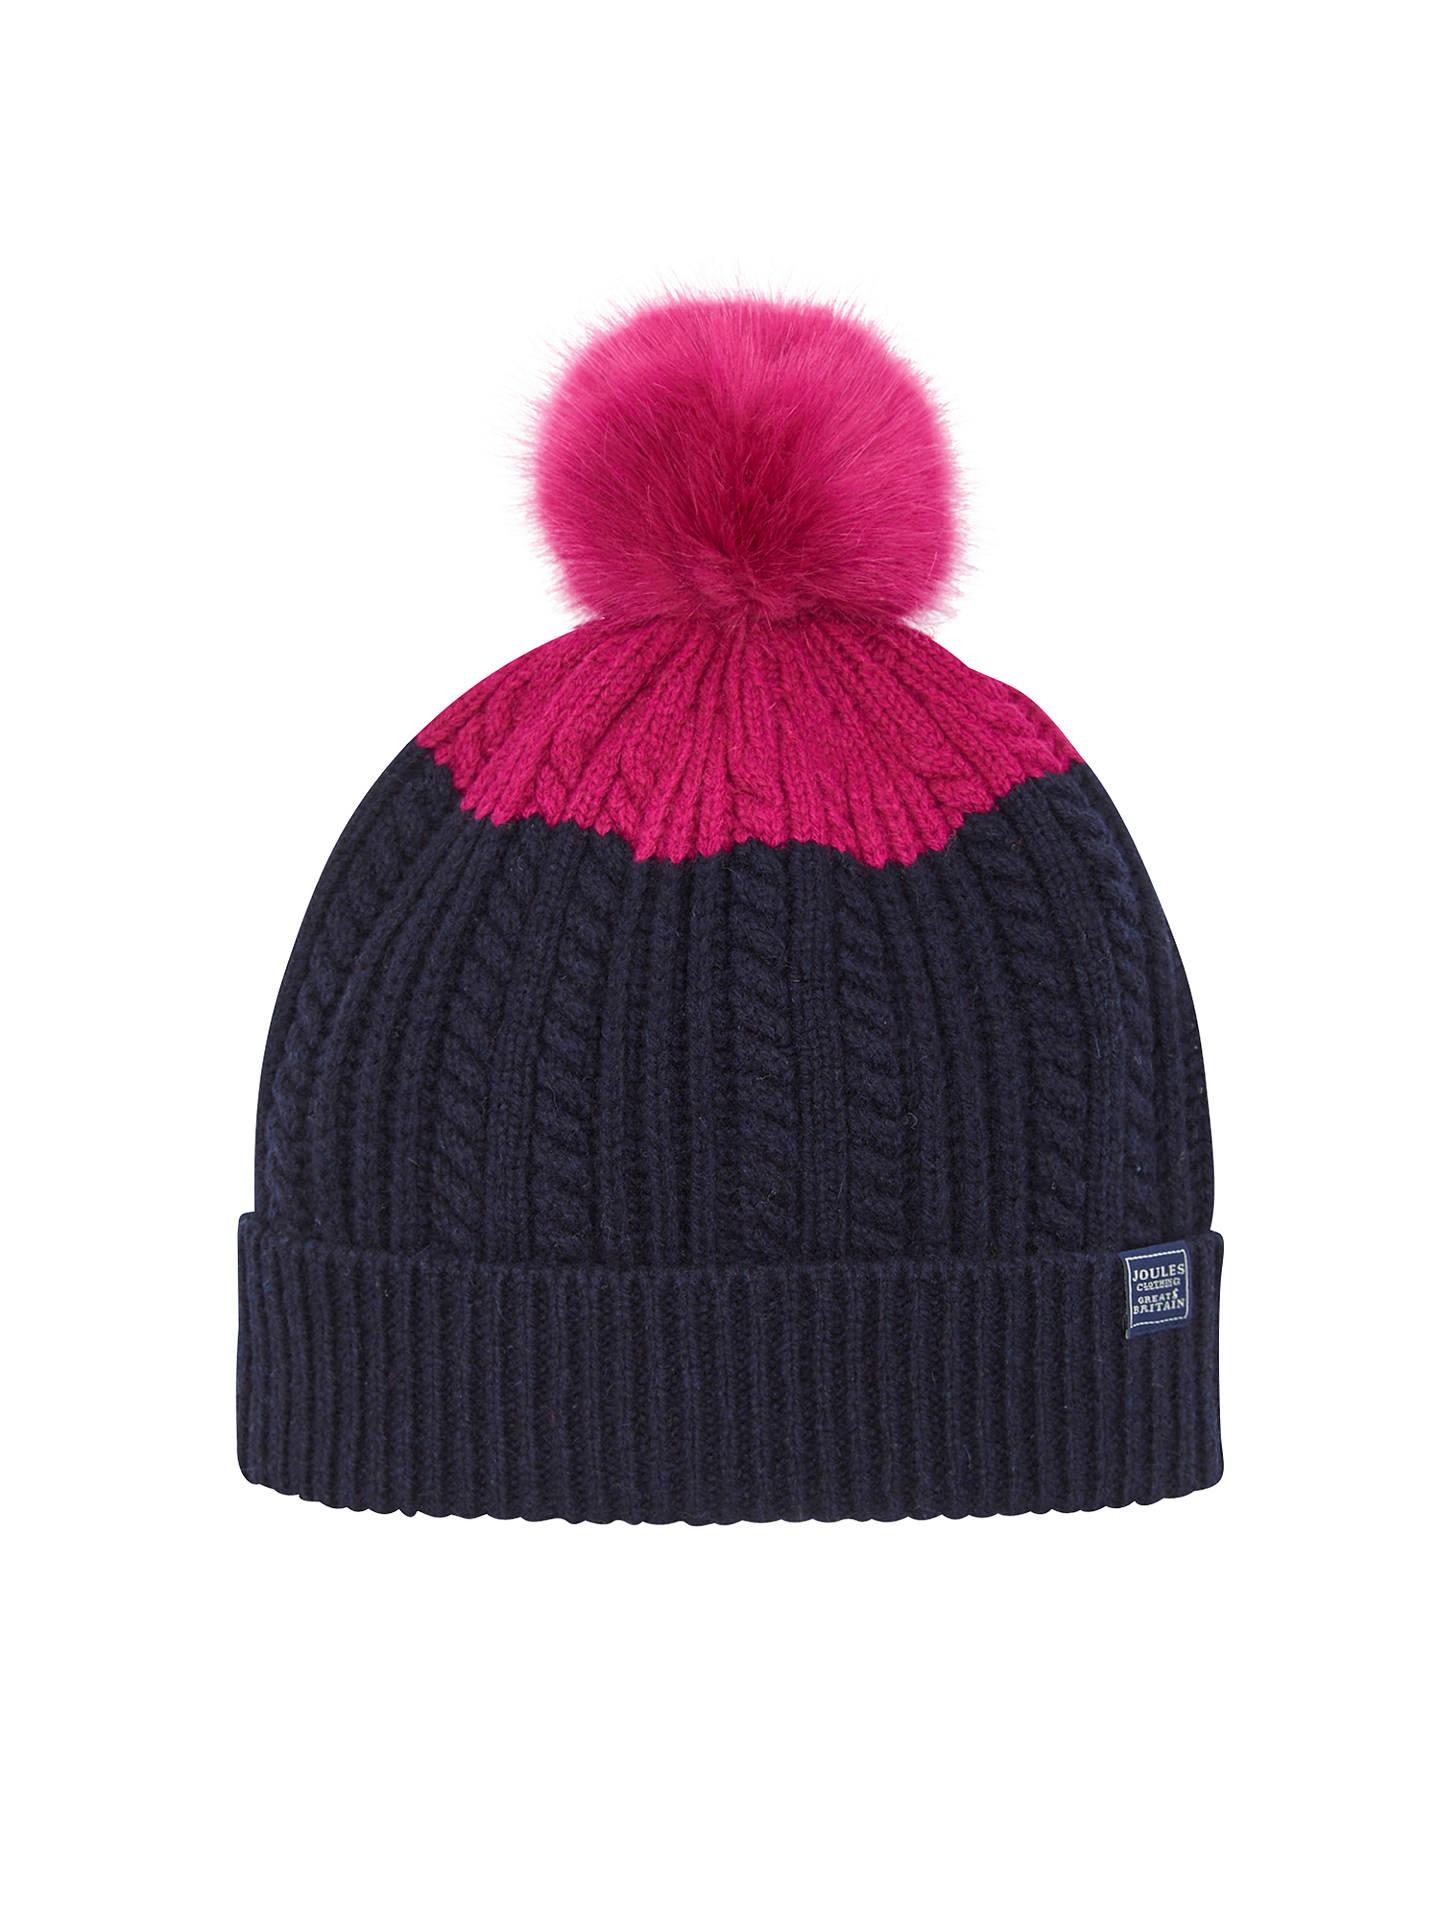 e9fa06e97 Joules Bobble Hat, Navy/Pink at John Lewis & Partners